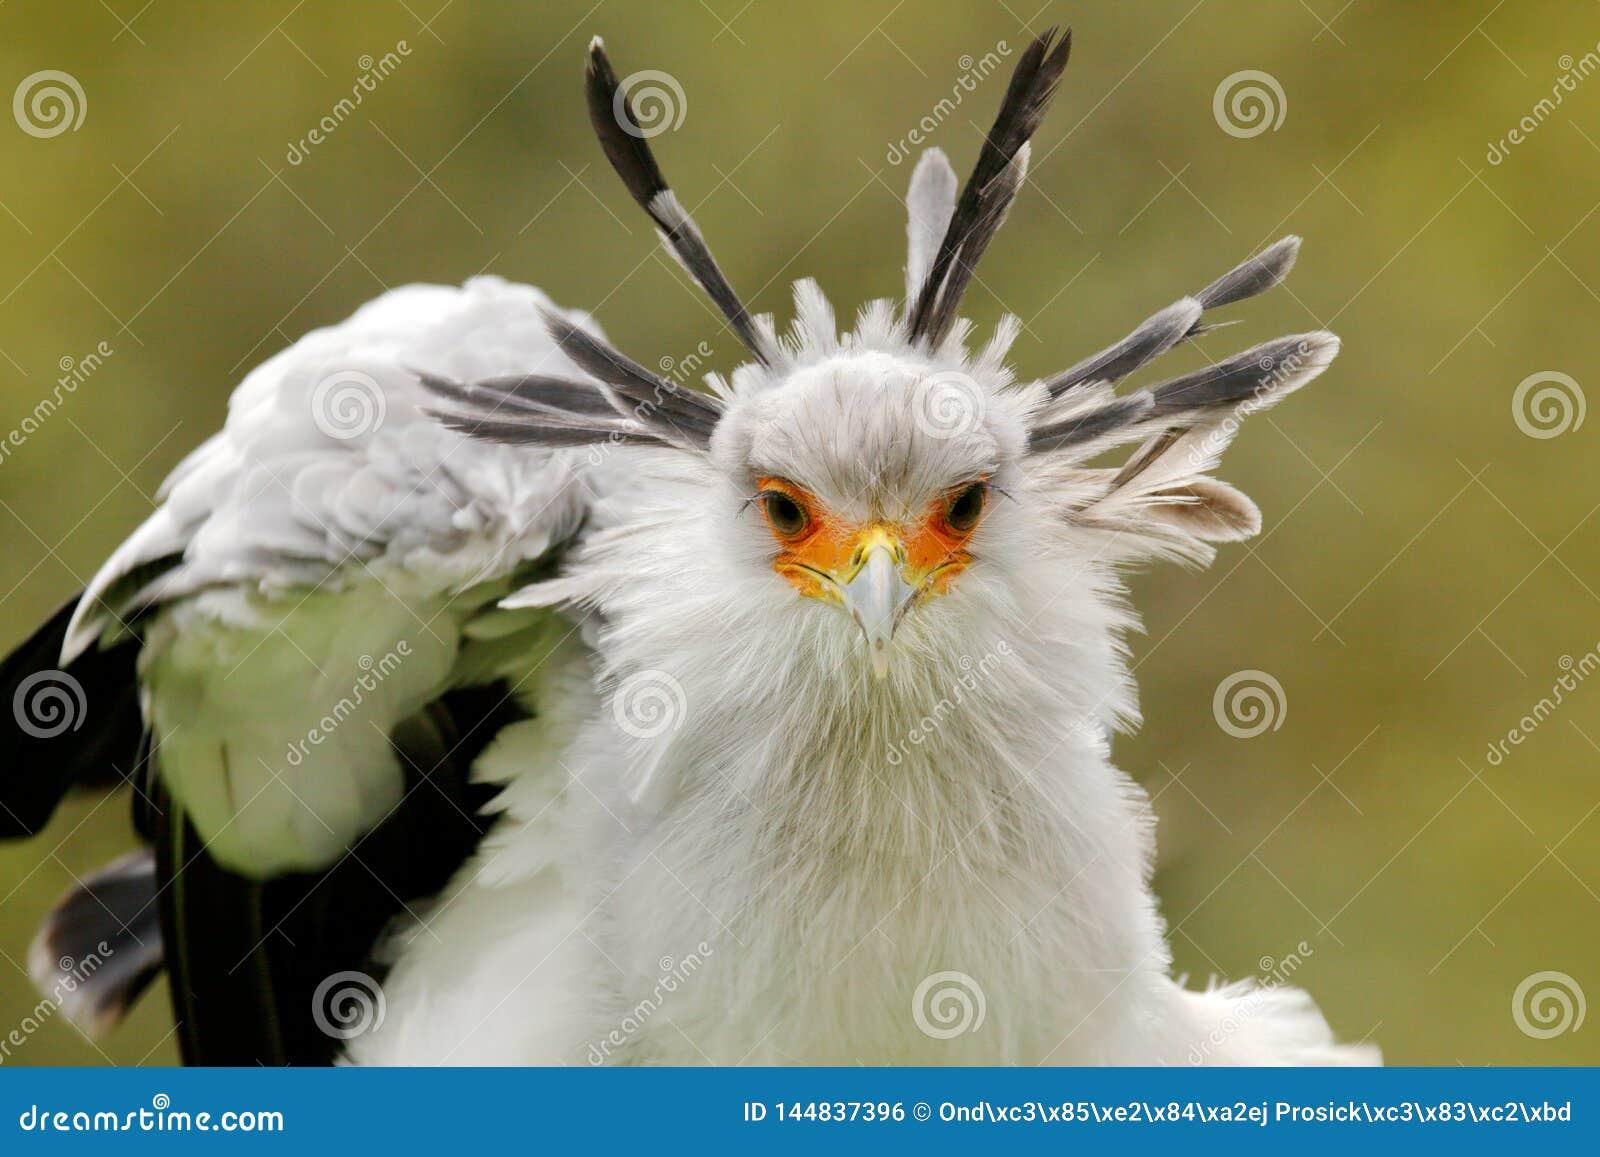 Secret?rio Bird, serpentarius do Sagit?rio, retrato do p?ssaro de rapina cinzento agrad?vel com cara alaranjada, Kenya, ?frica Ce